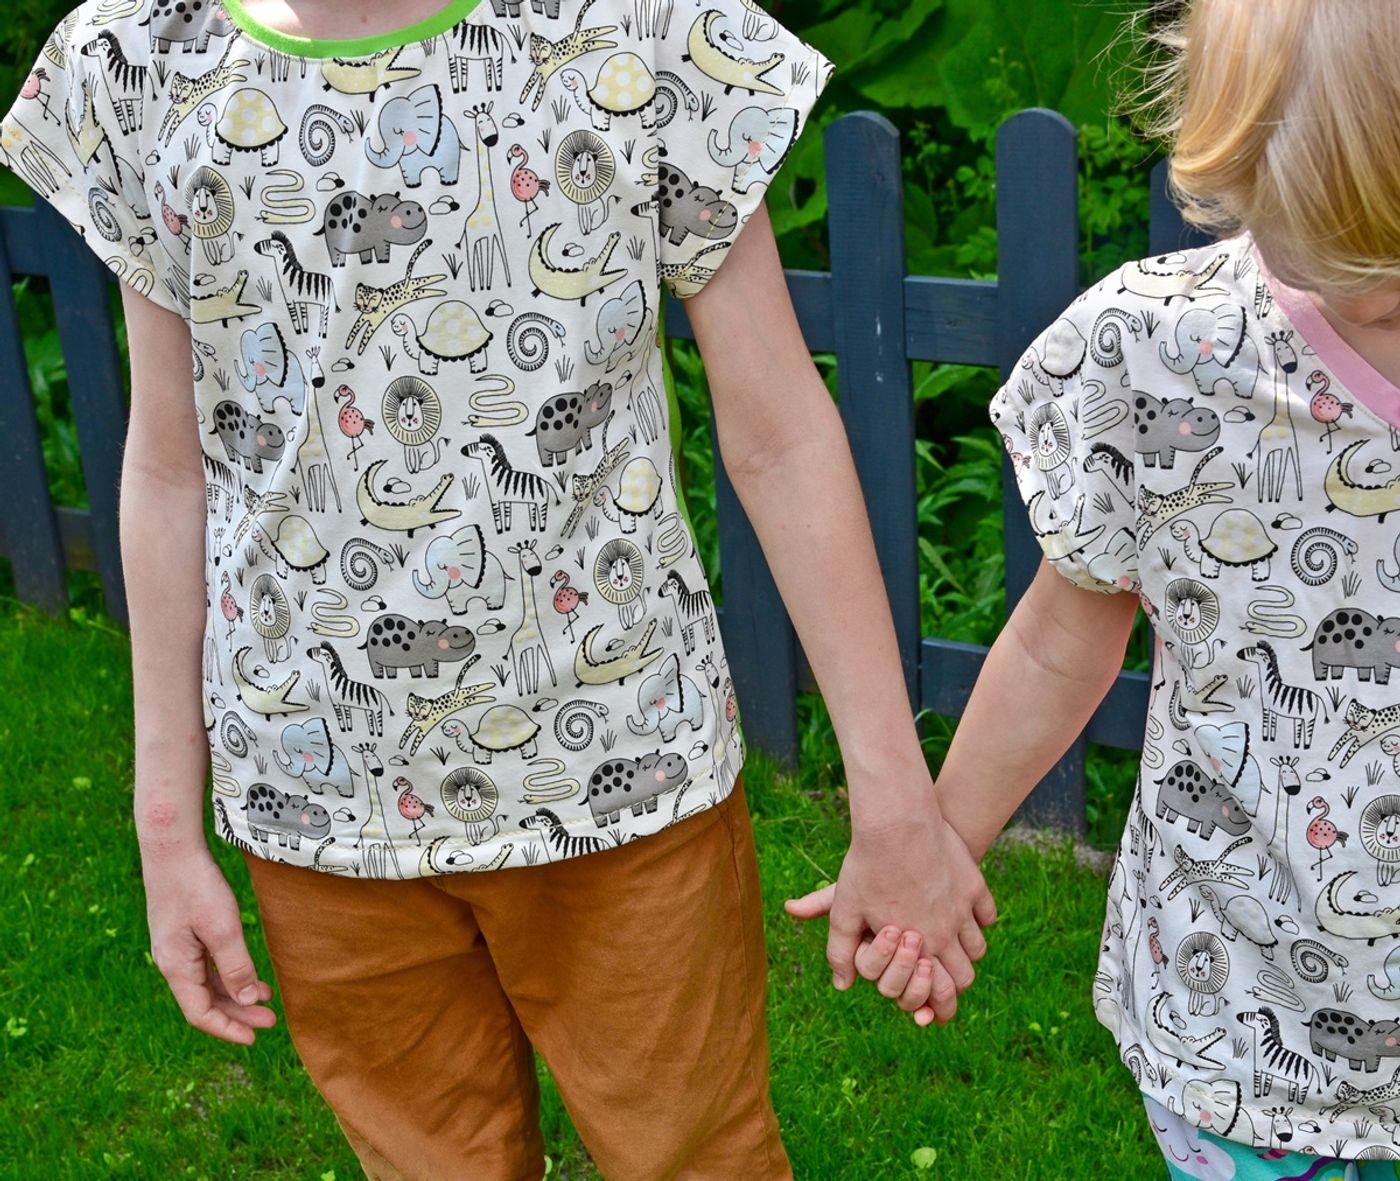 Produktfoto 14 von MiToSa-Kreativ für Schnittmuster Kombi E-Book Family Shirt Kinder, Damen & Männer Gr. 74 - 164, 34 - 52 & XS - 3XL